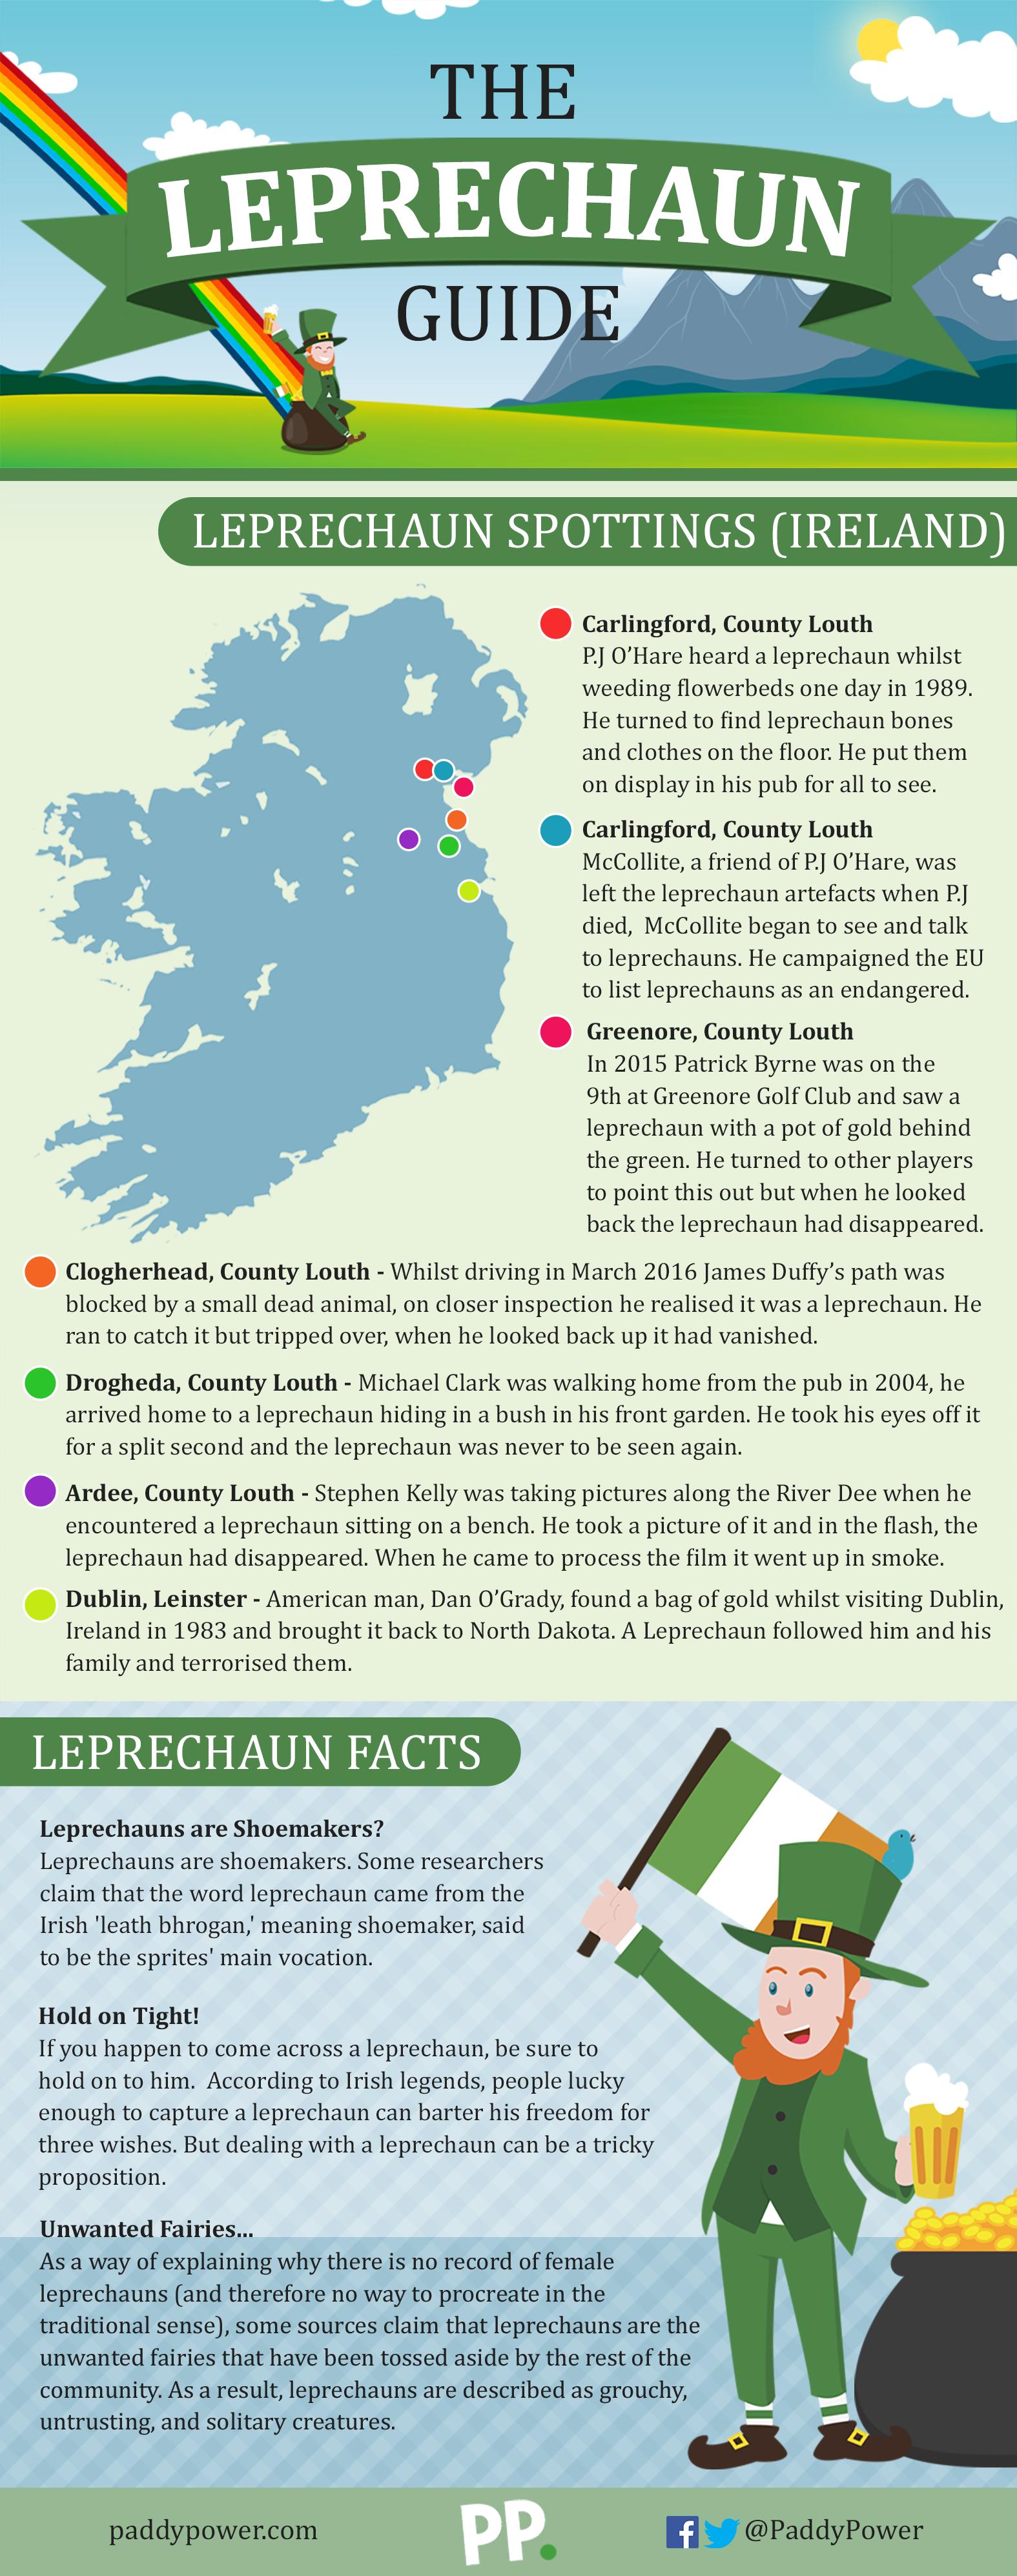 Leprechaun Guide